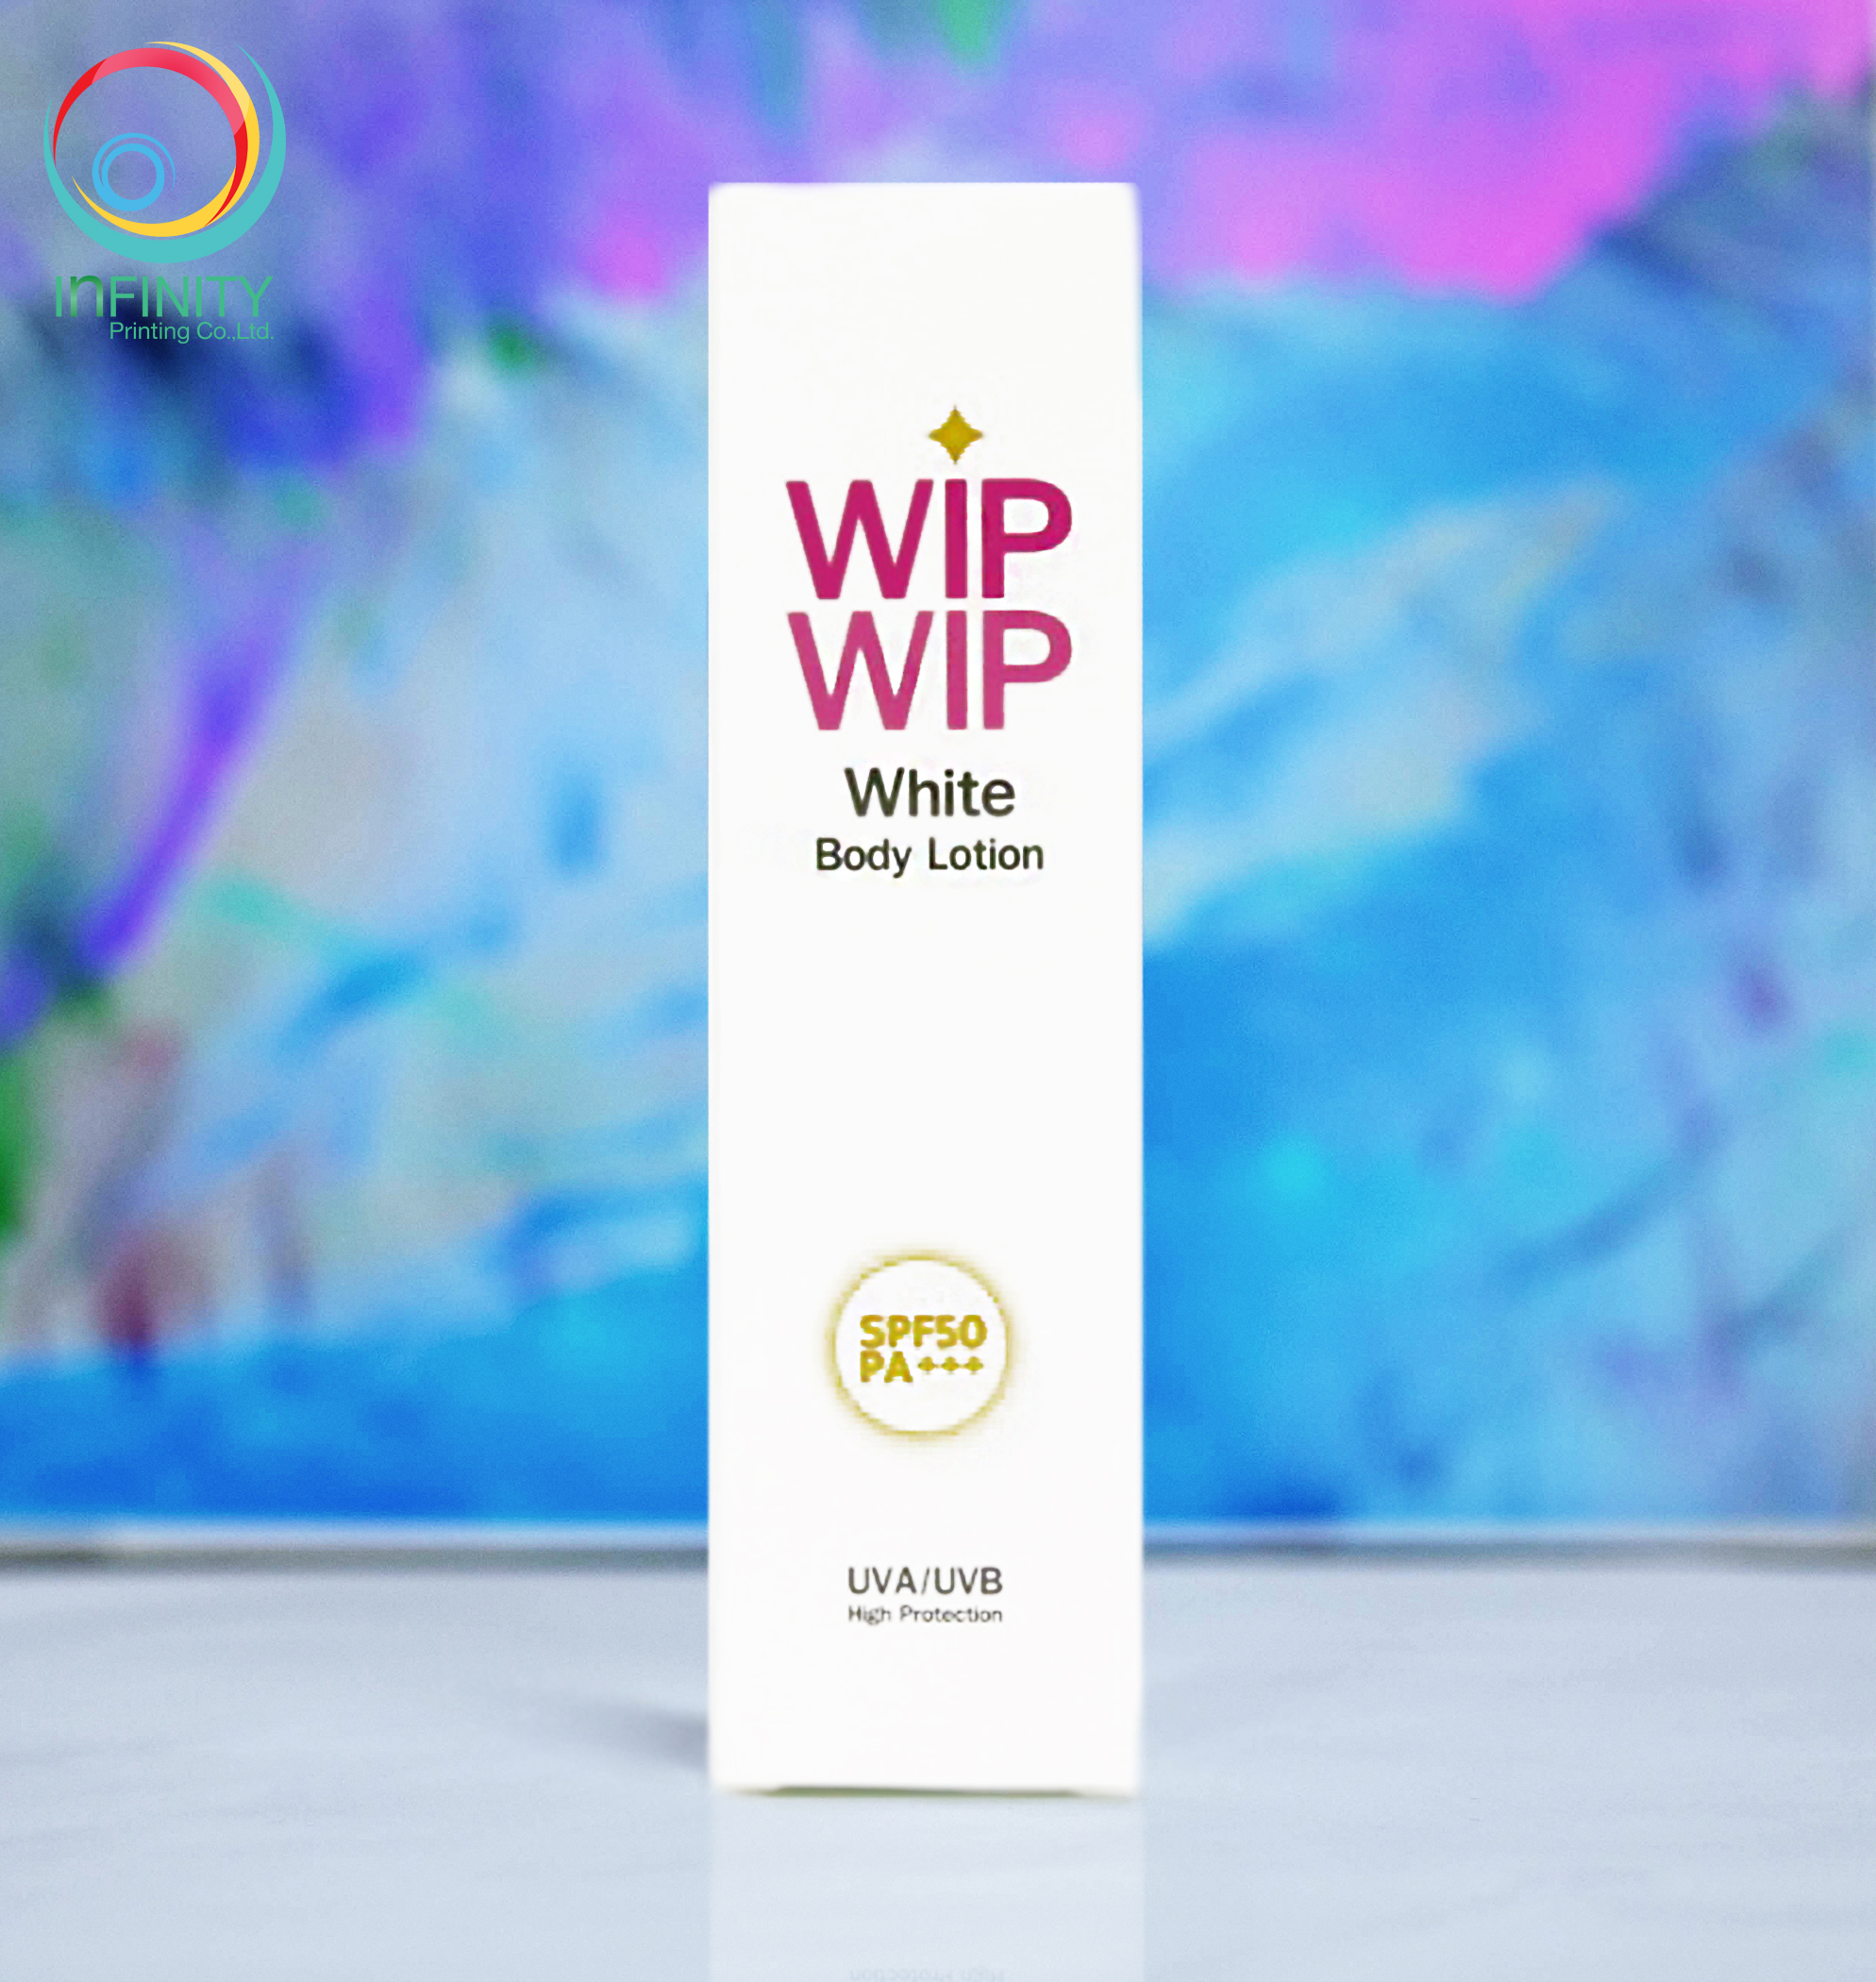 WIP White Body Lotion